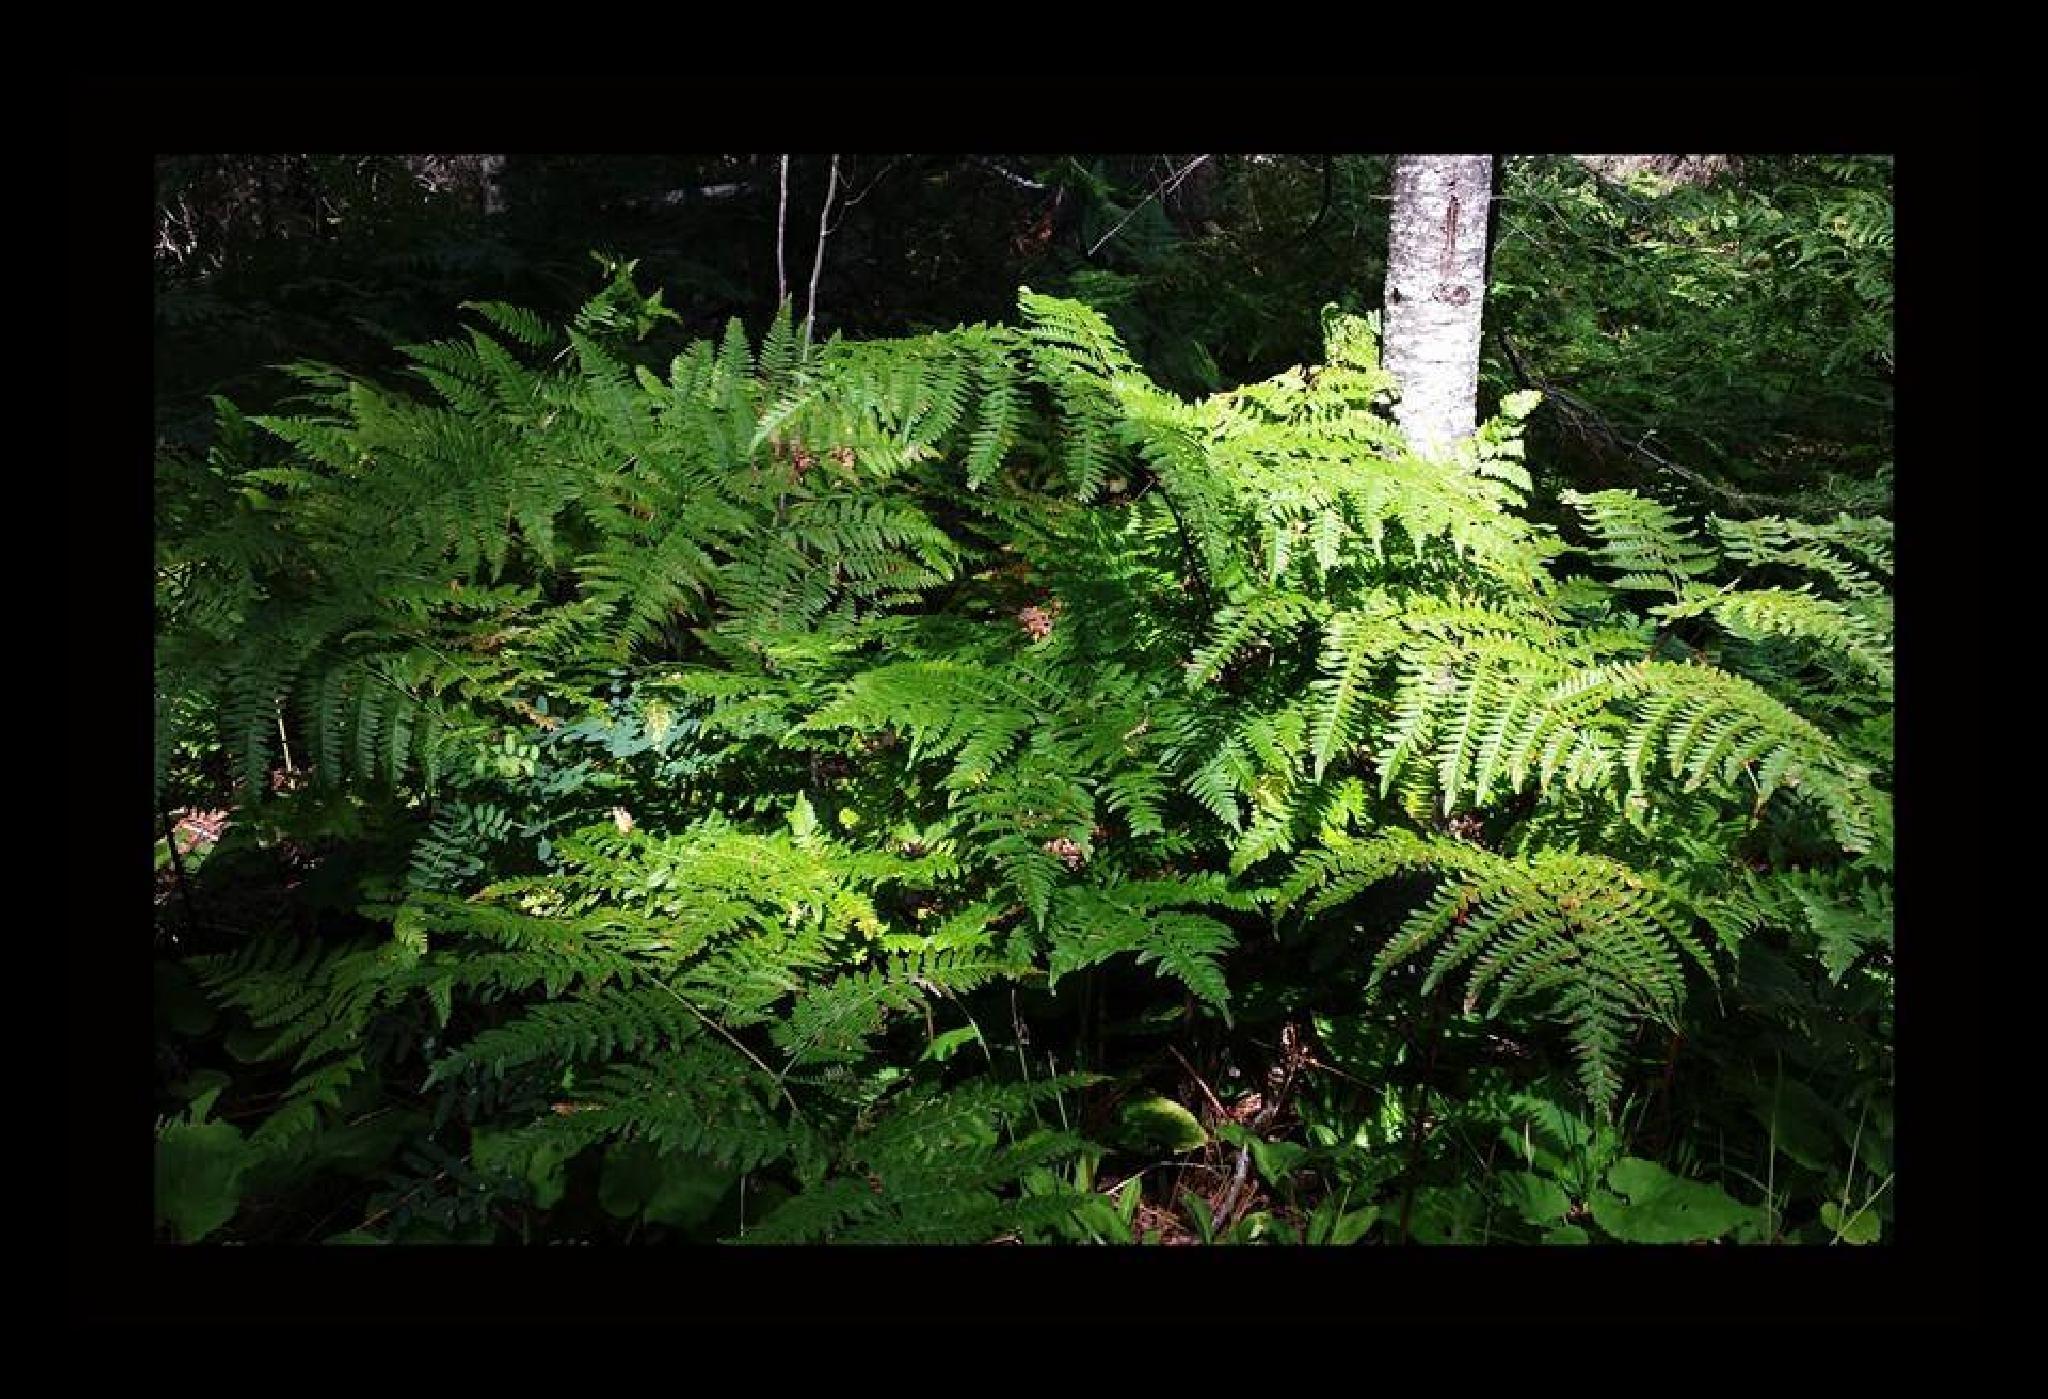 Forest Ferns Keweenaw Peninsula by mimi.difrancesca